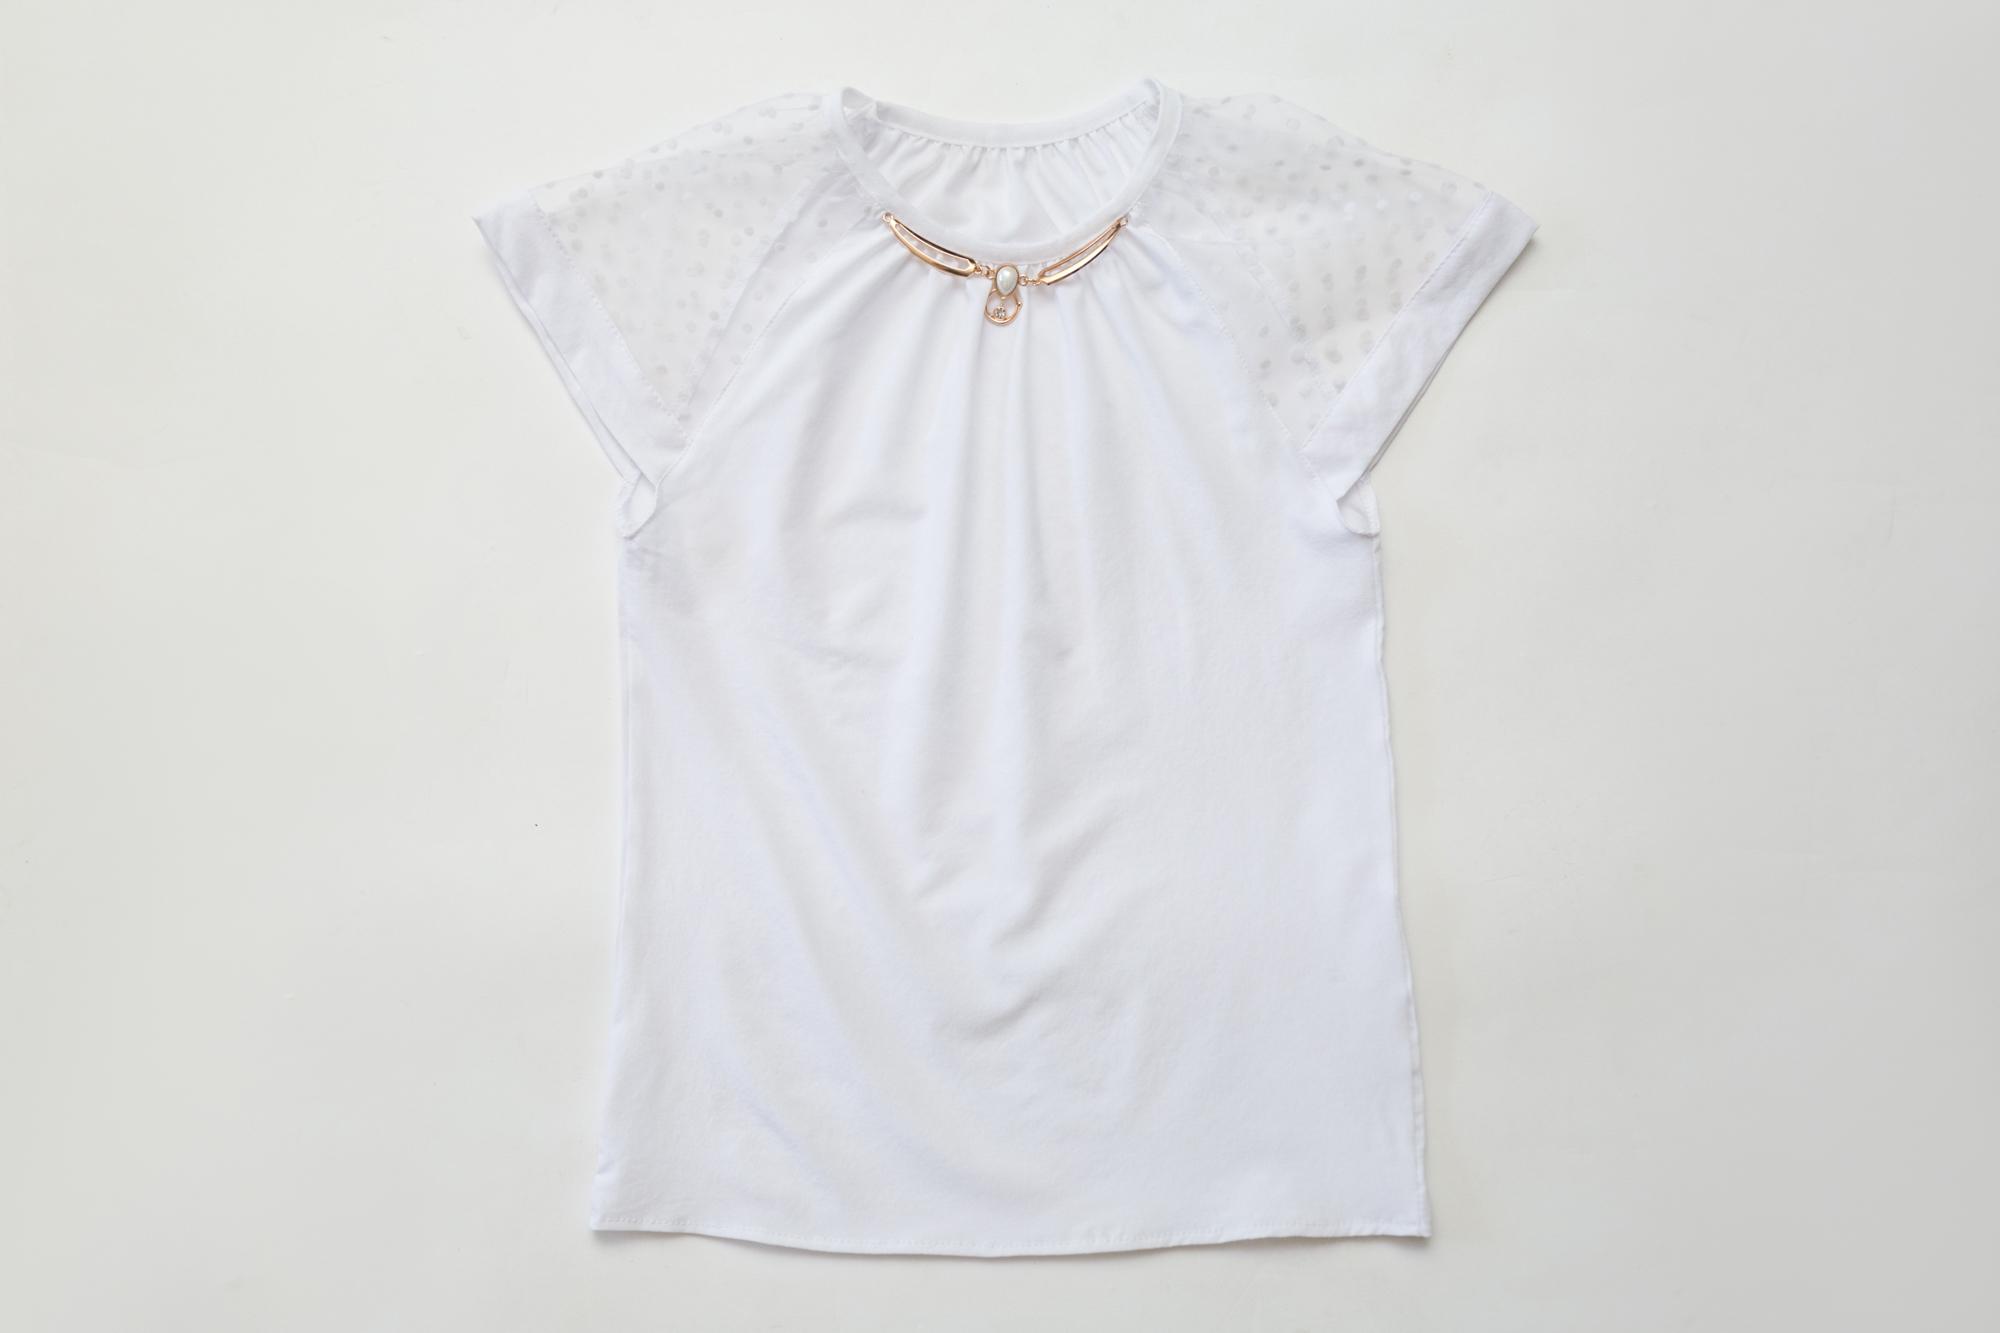 Блузка SmileTime для девочки Olivia, белая